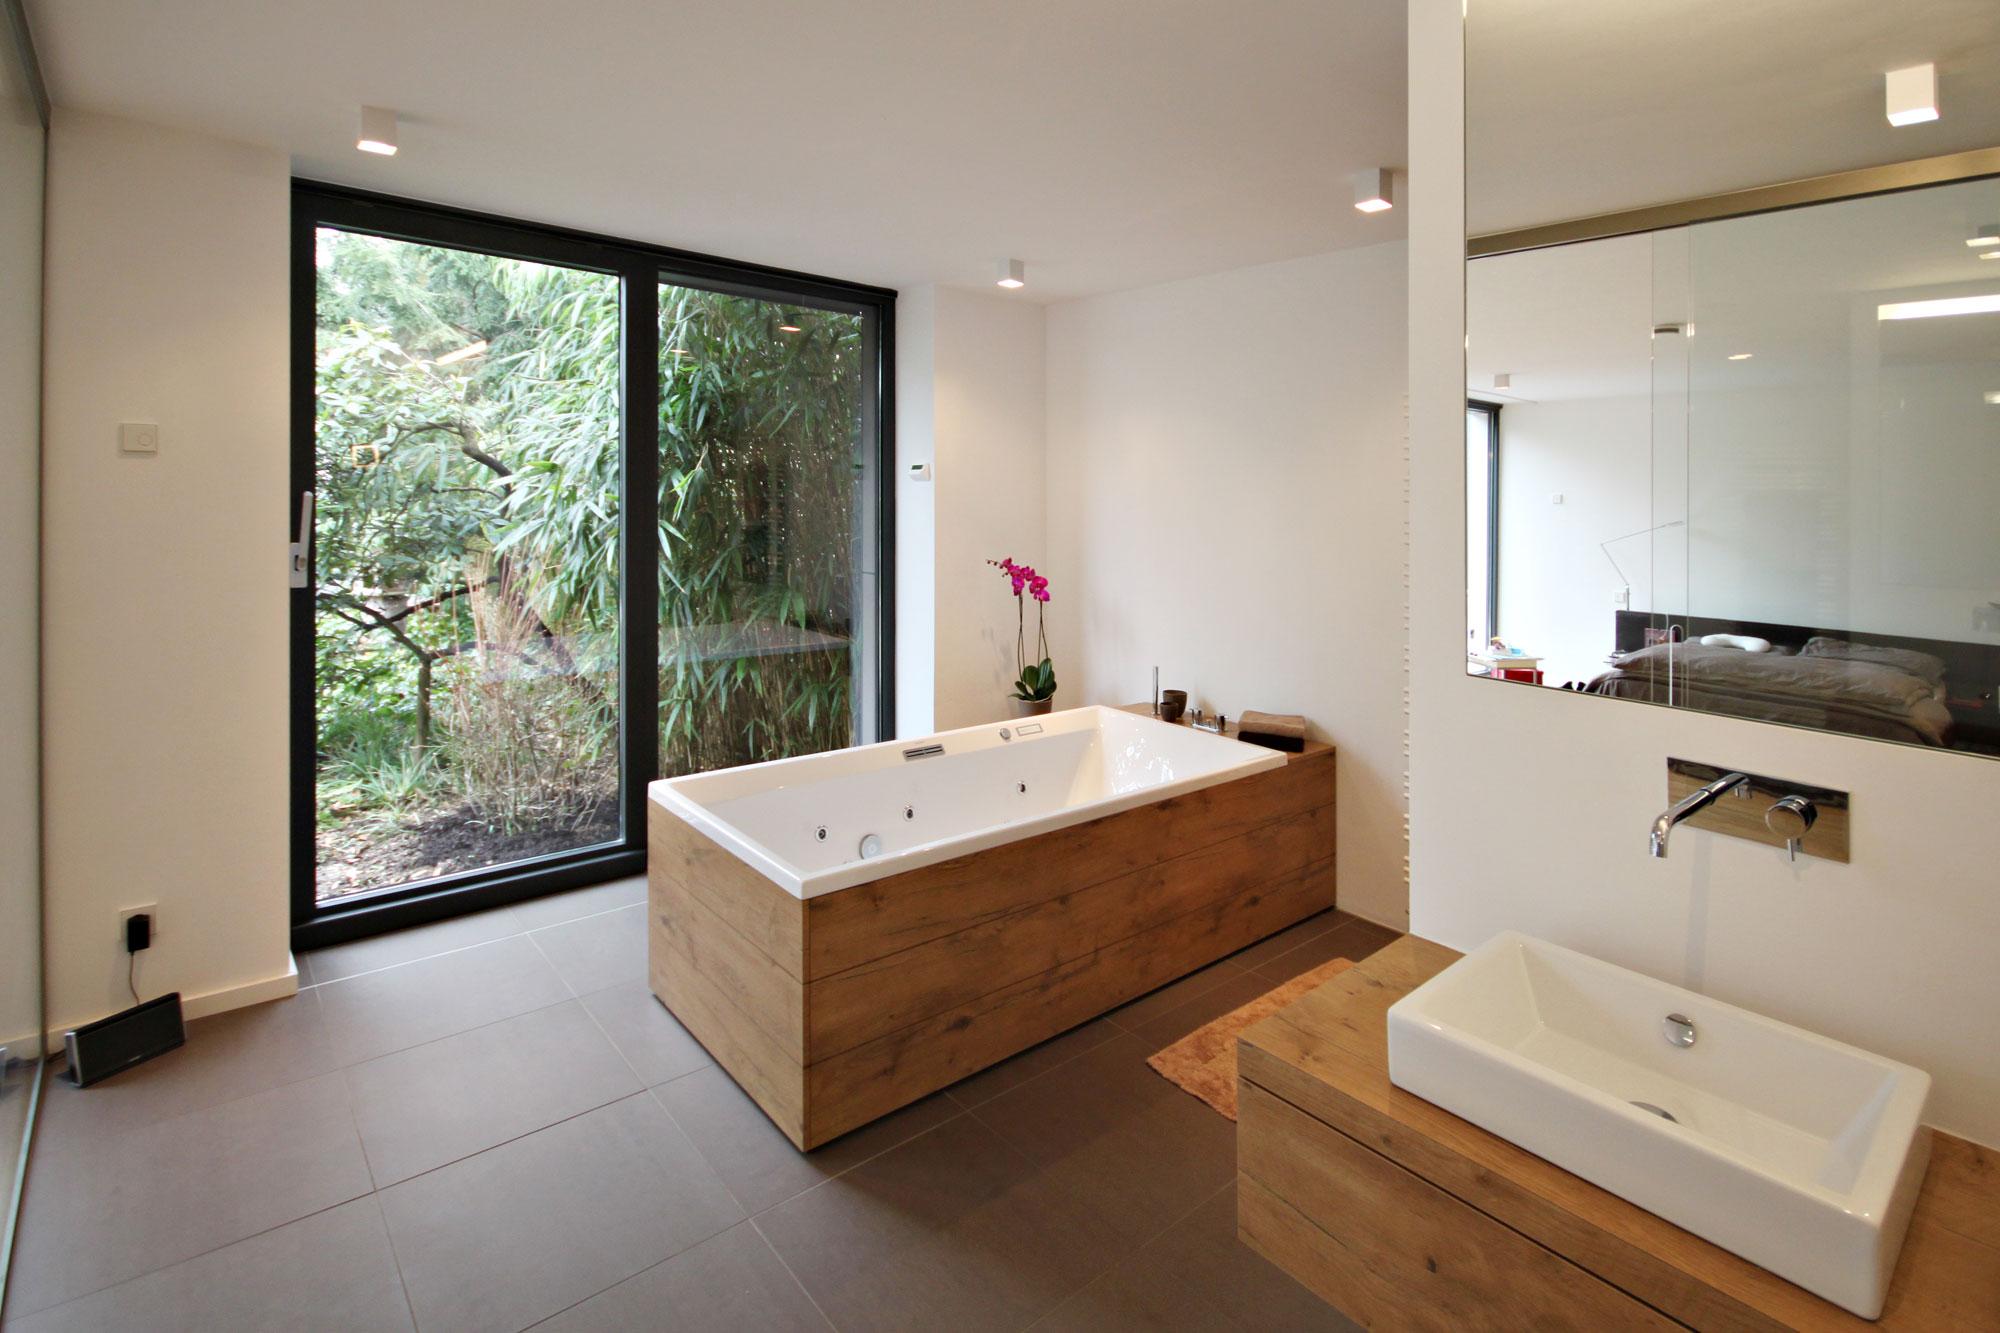 bad legno werkst tte f r holzarbeiten. Black Bedroom Furniture Sets. Home Design Ideas